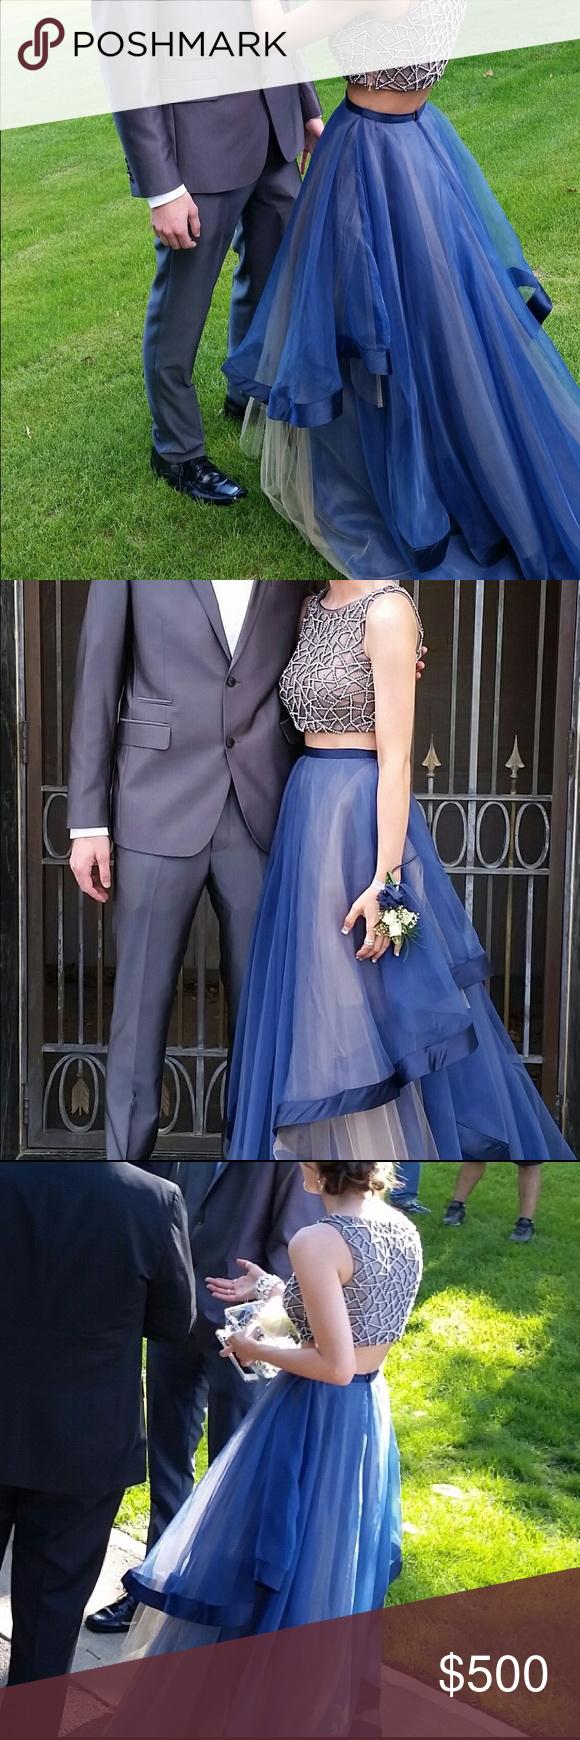 Dark bluenavy prom dress navy prom dresses embellished top and